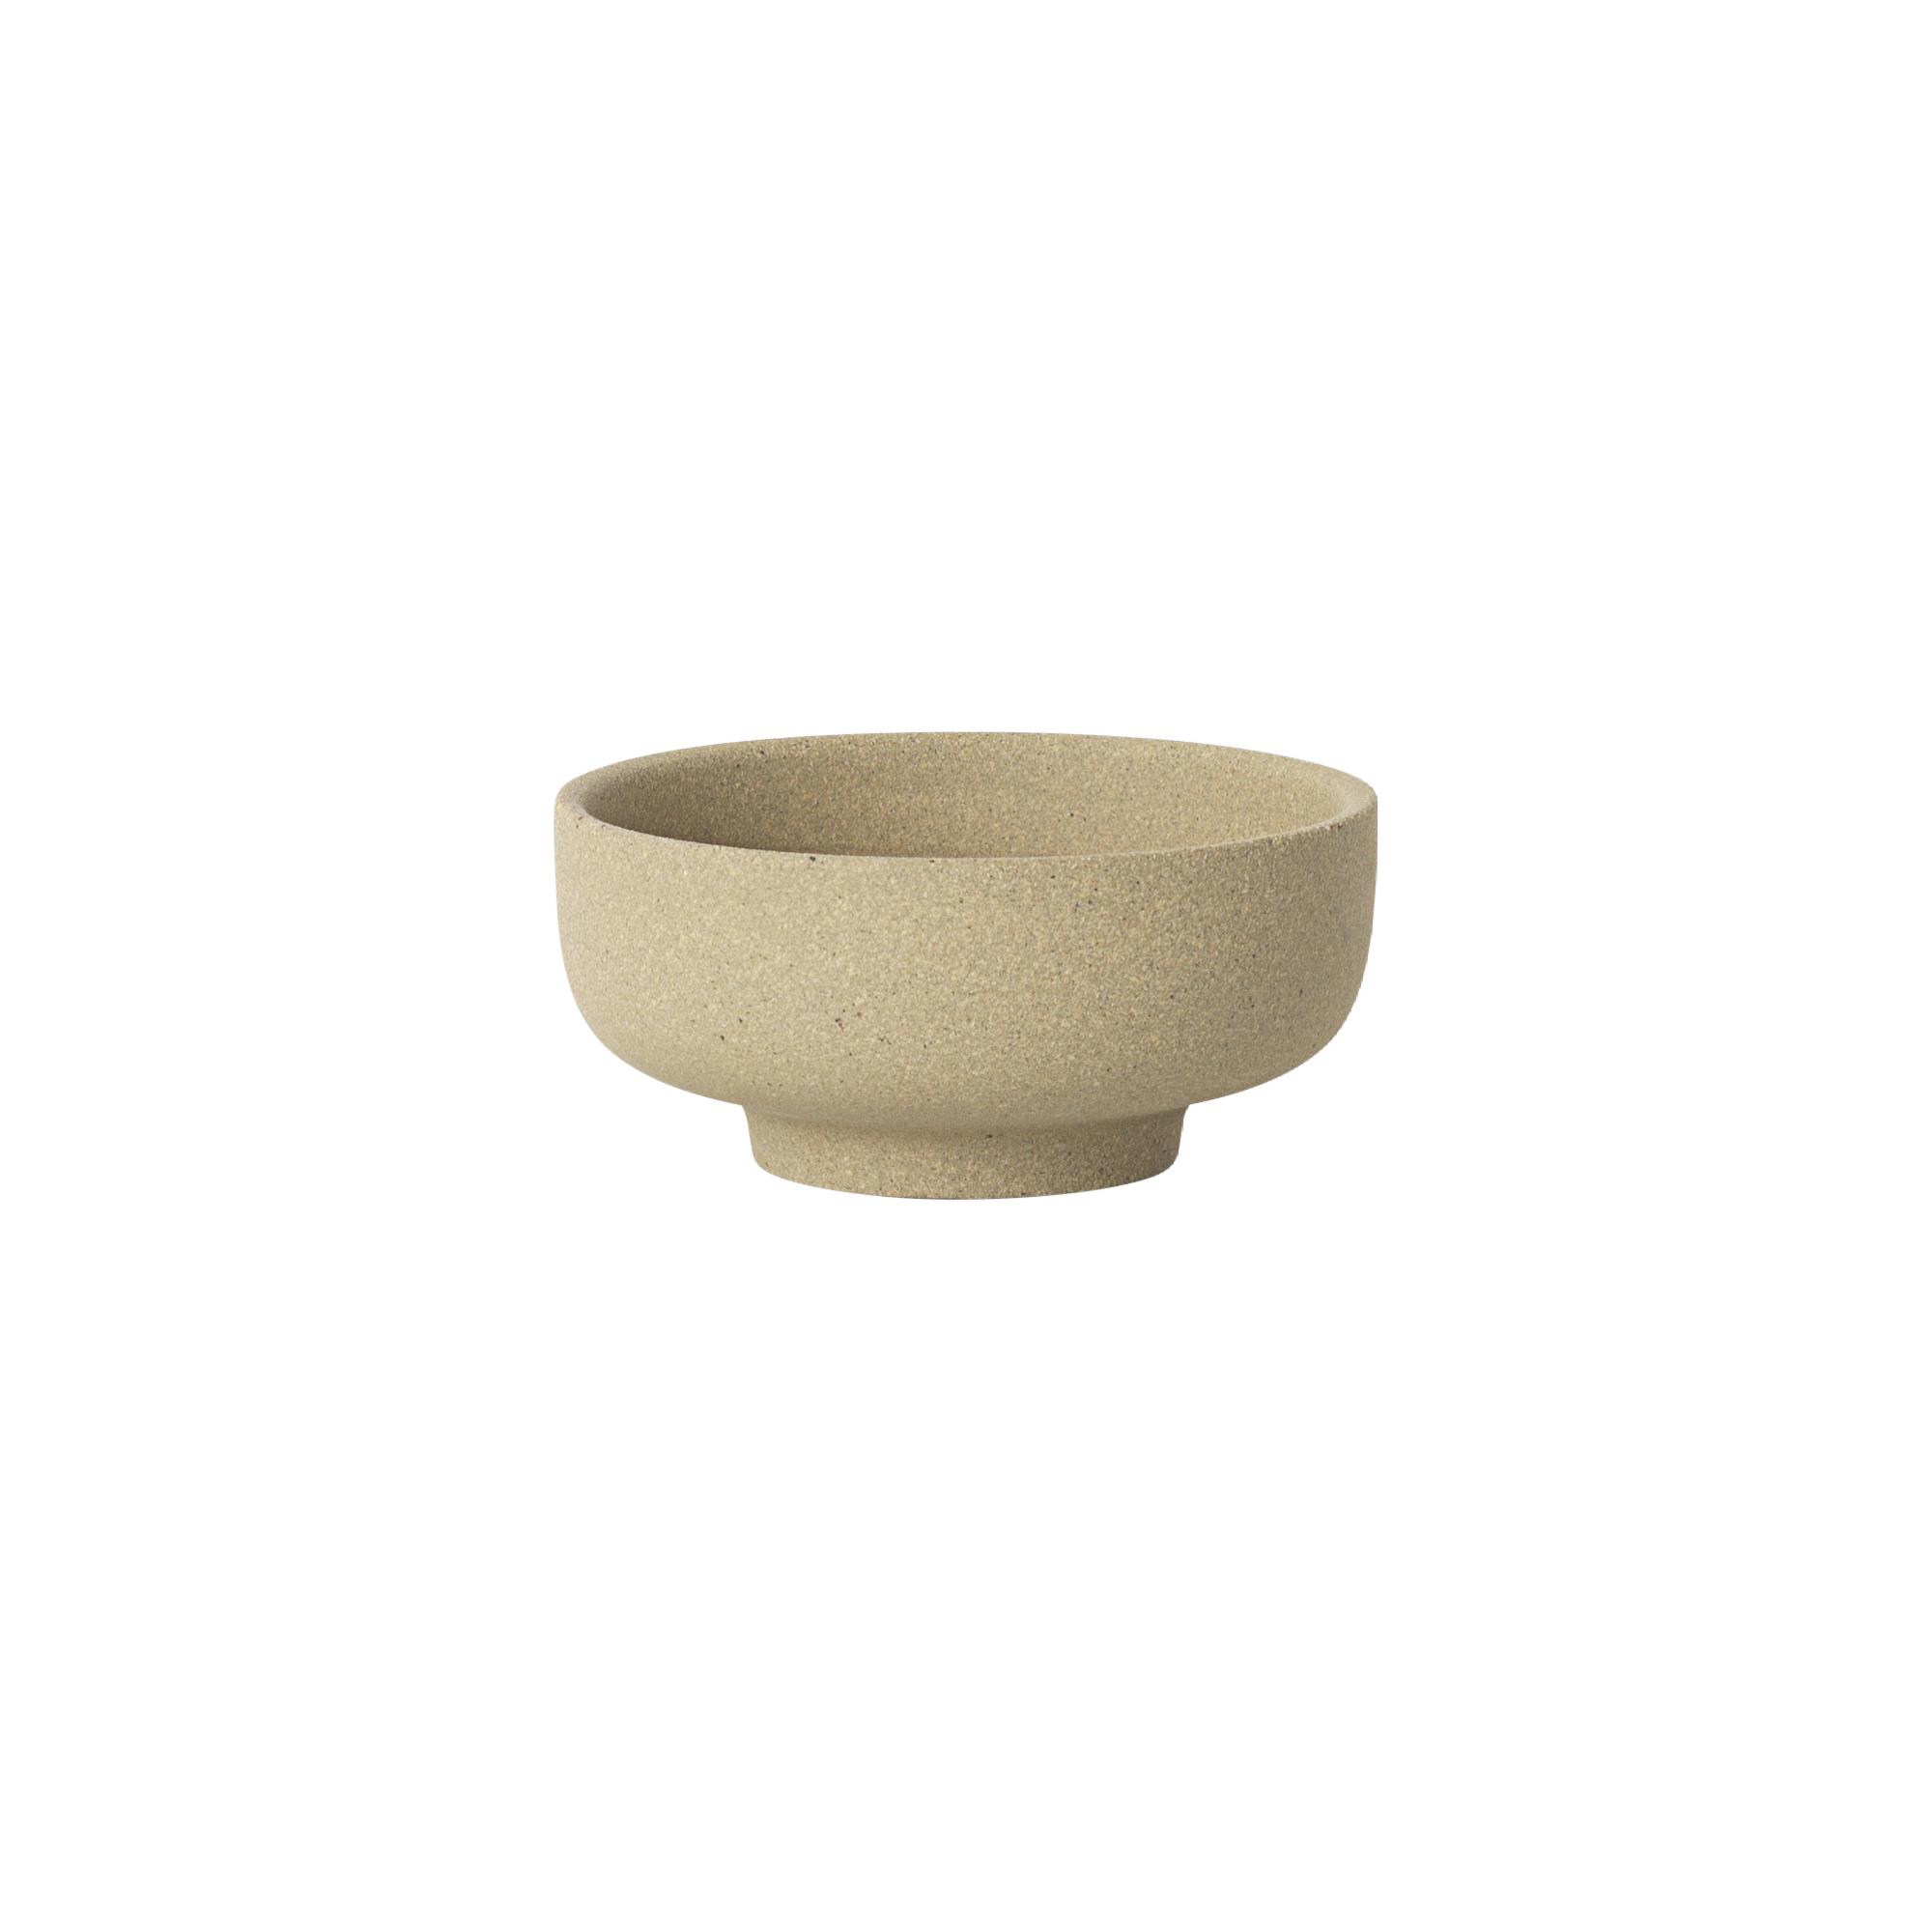 #022   Sand Salt Jar + Horn Serving Spoon   H3.3cm x 7.5cm Hire Price - £5  Minimum Order 3 Current Stock Available 12